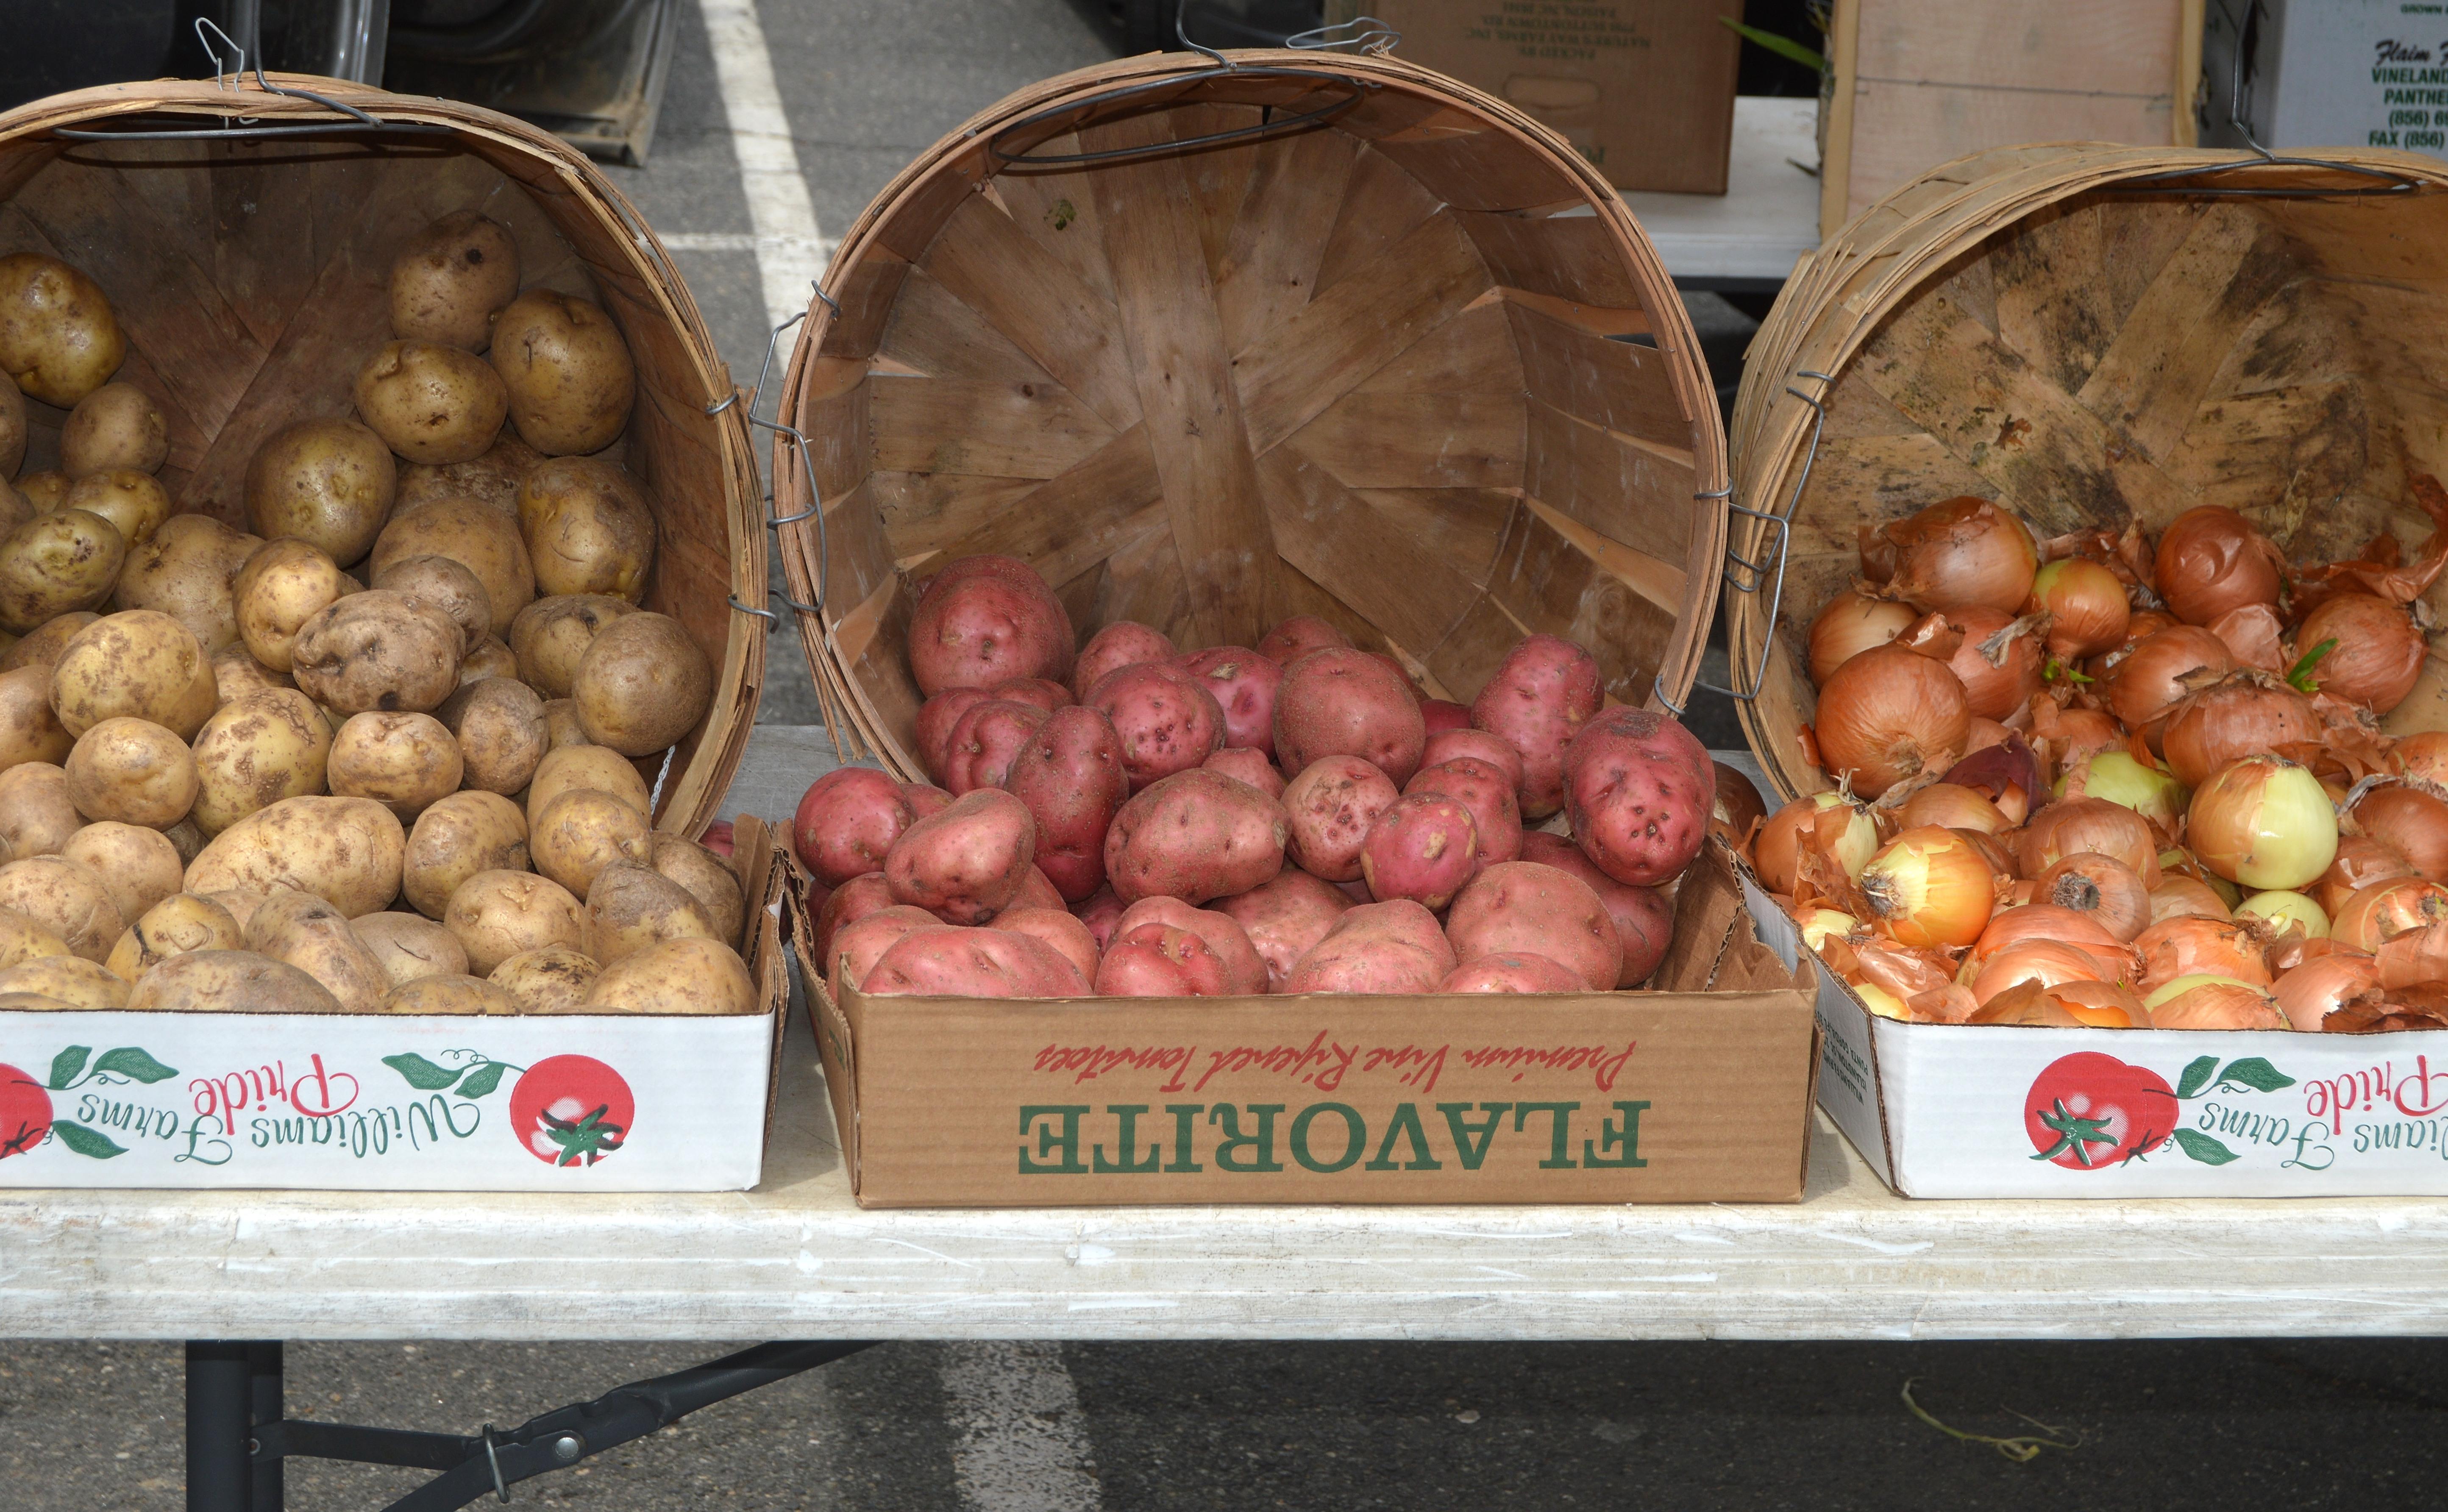 07904625132070de7c4f_Farmer_s_Market_-_potatoes.JPG